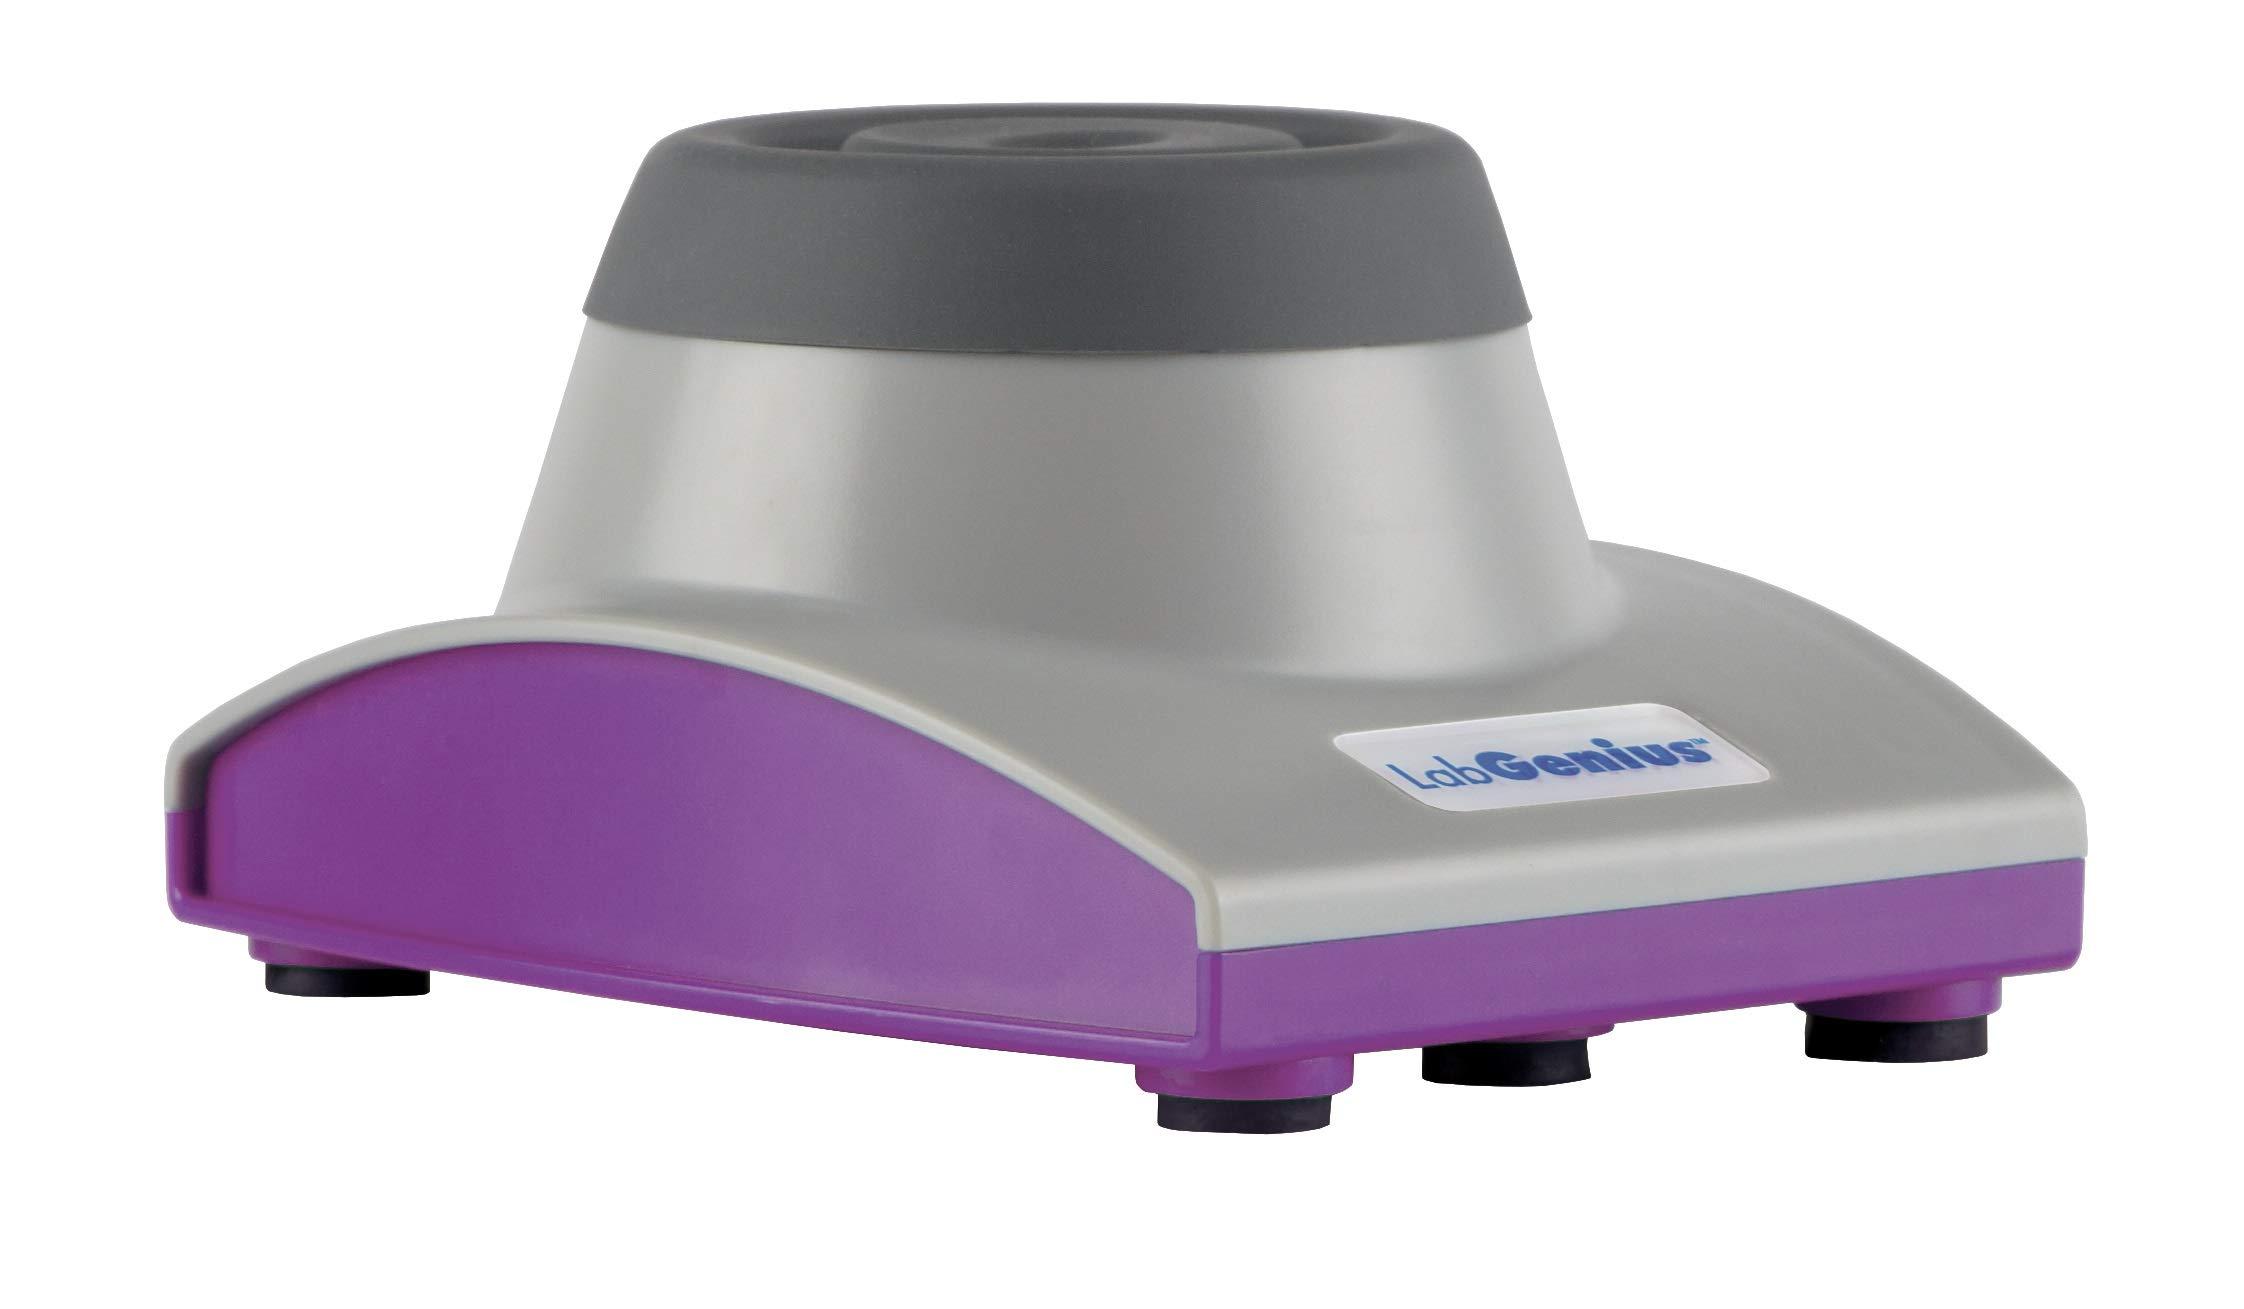 LabGenius HS120155DS Mini Vortex Mixer Advanced, Grey/Purple, ABS Plastic